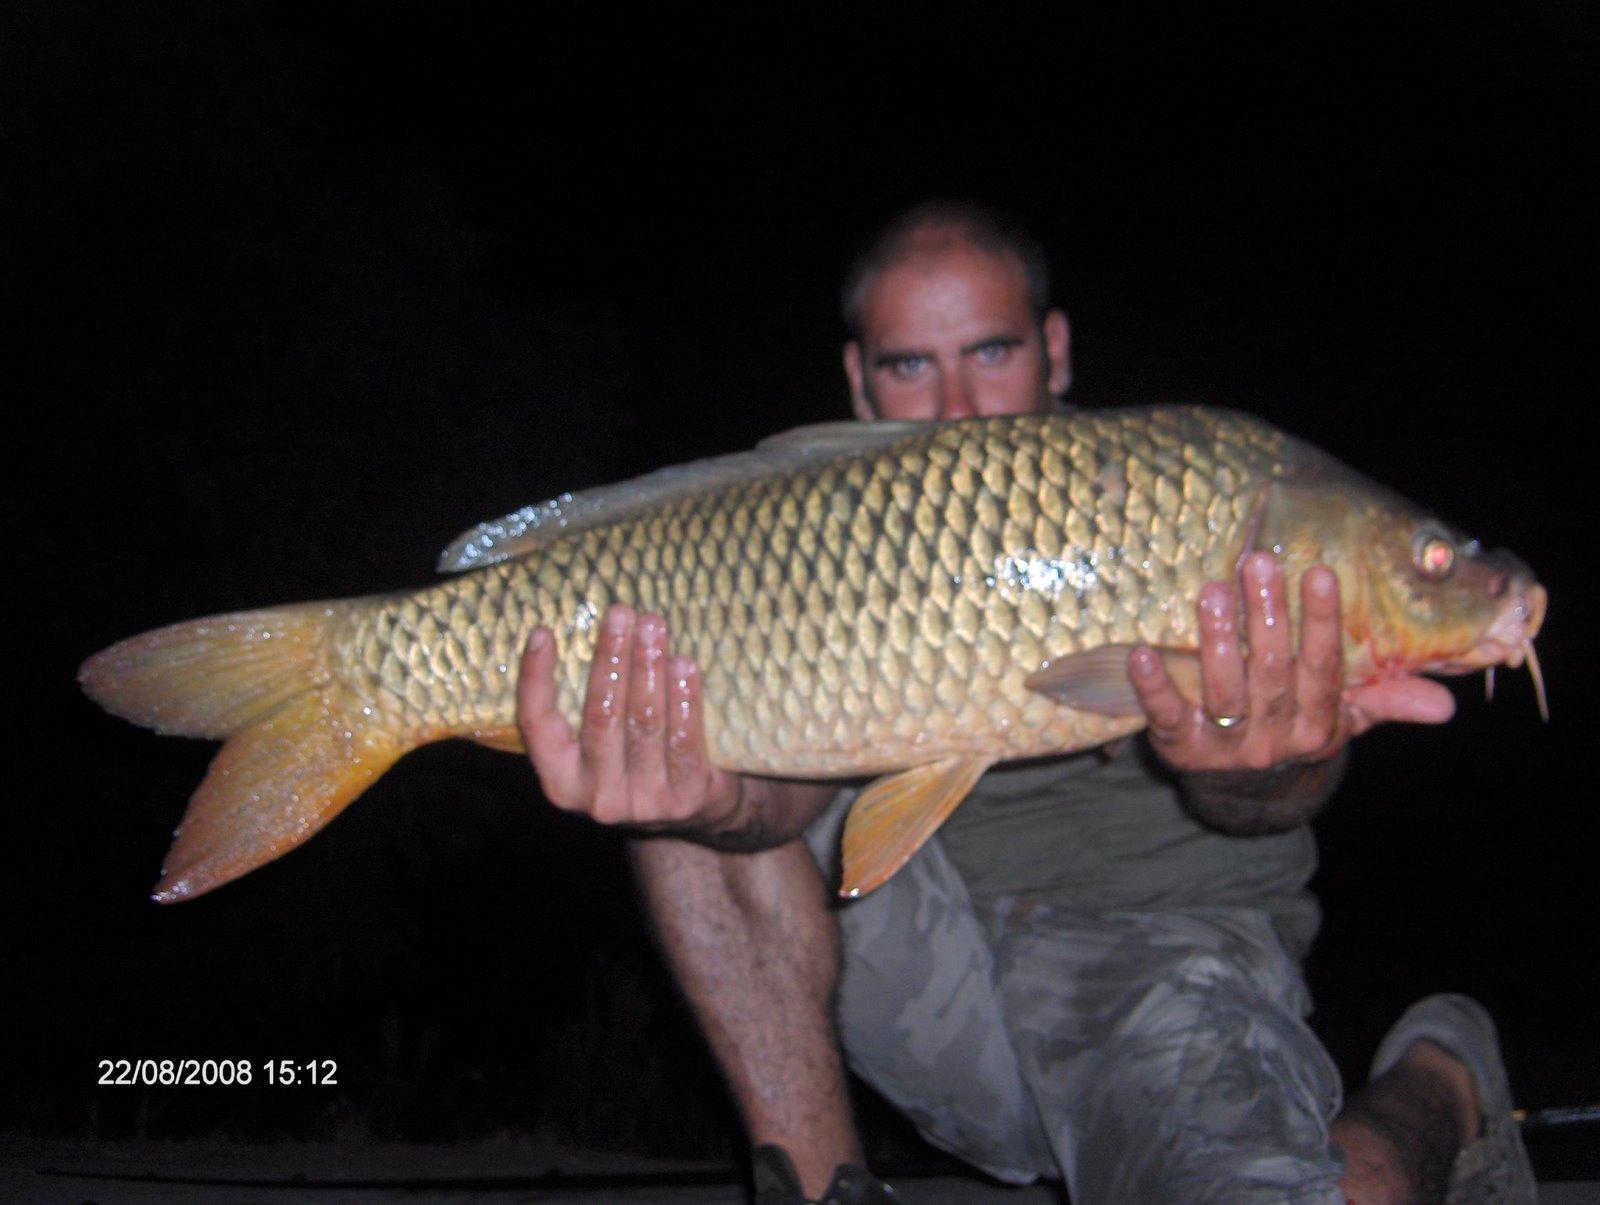 Carpa 7 kg Lagoa de Mira 24 Agosto 2008